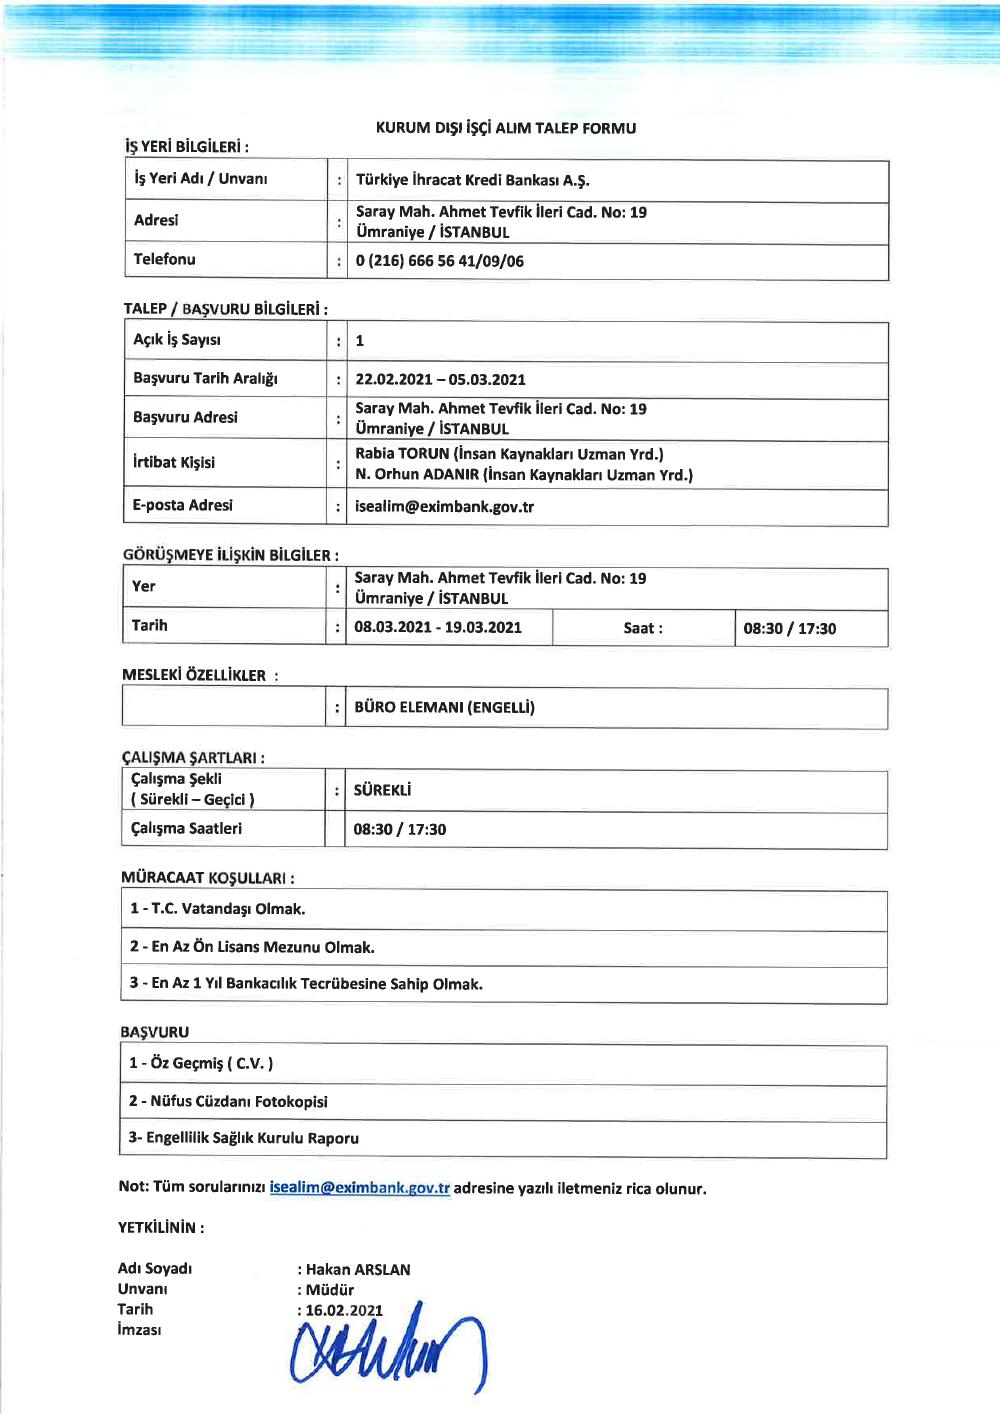 istanbul-turkiye-ihracat-kredi-bankasi-a-s-engelli-pers-alimi-05-03-2021-000001.png